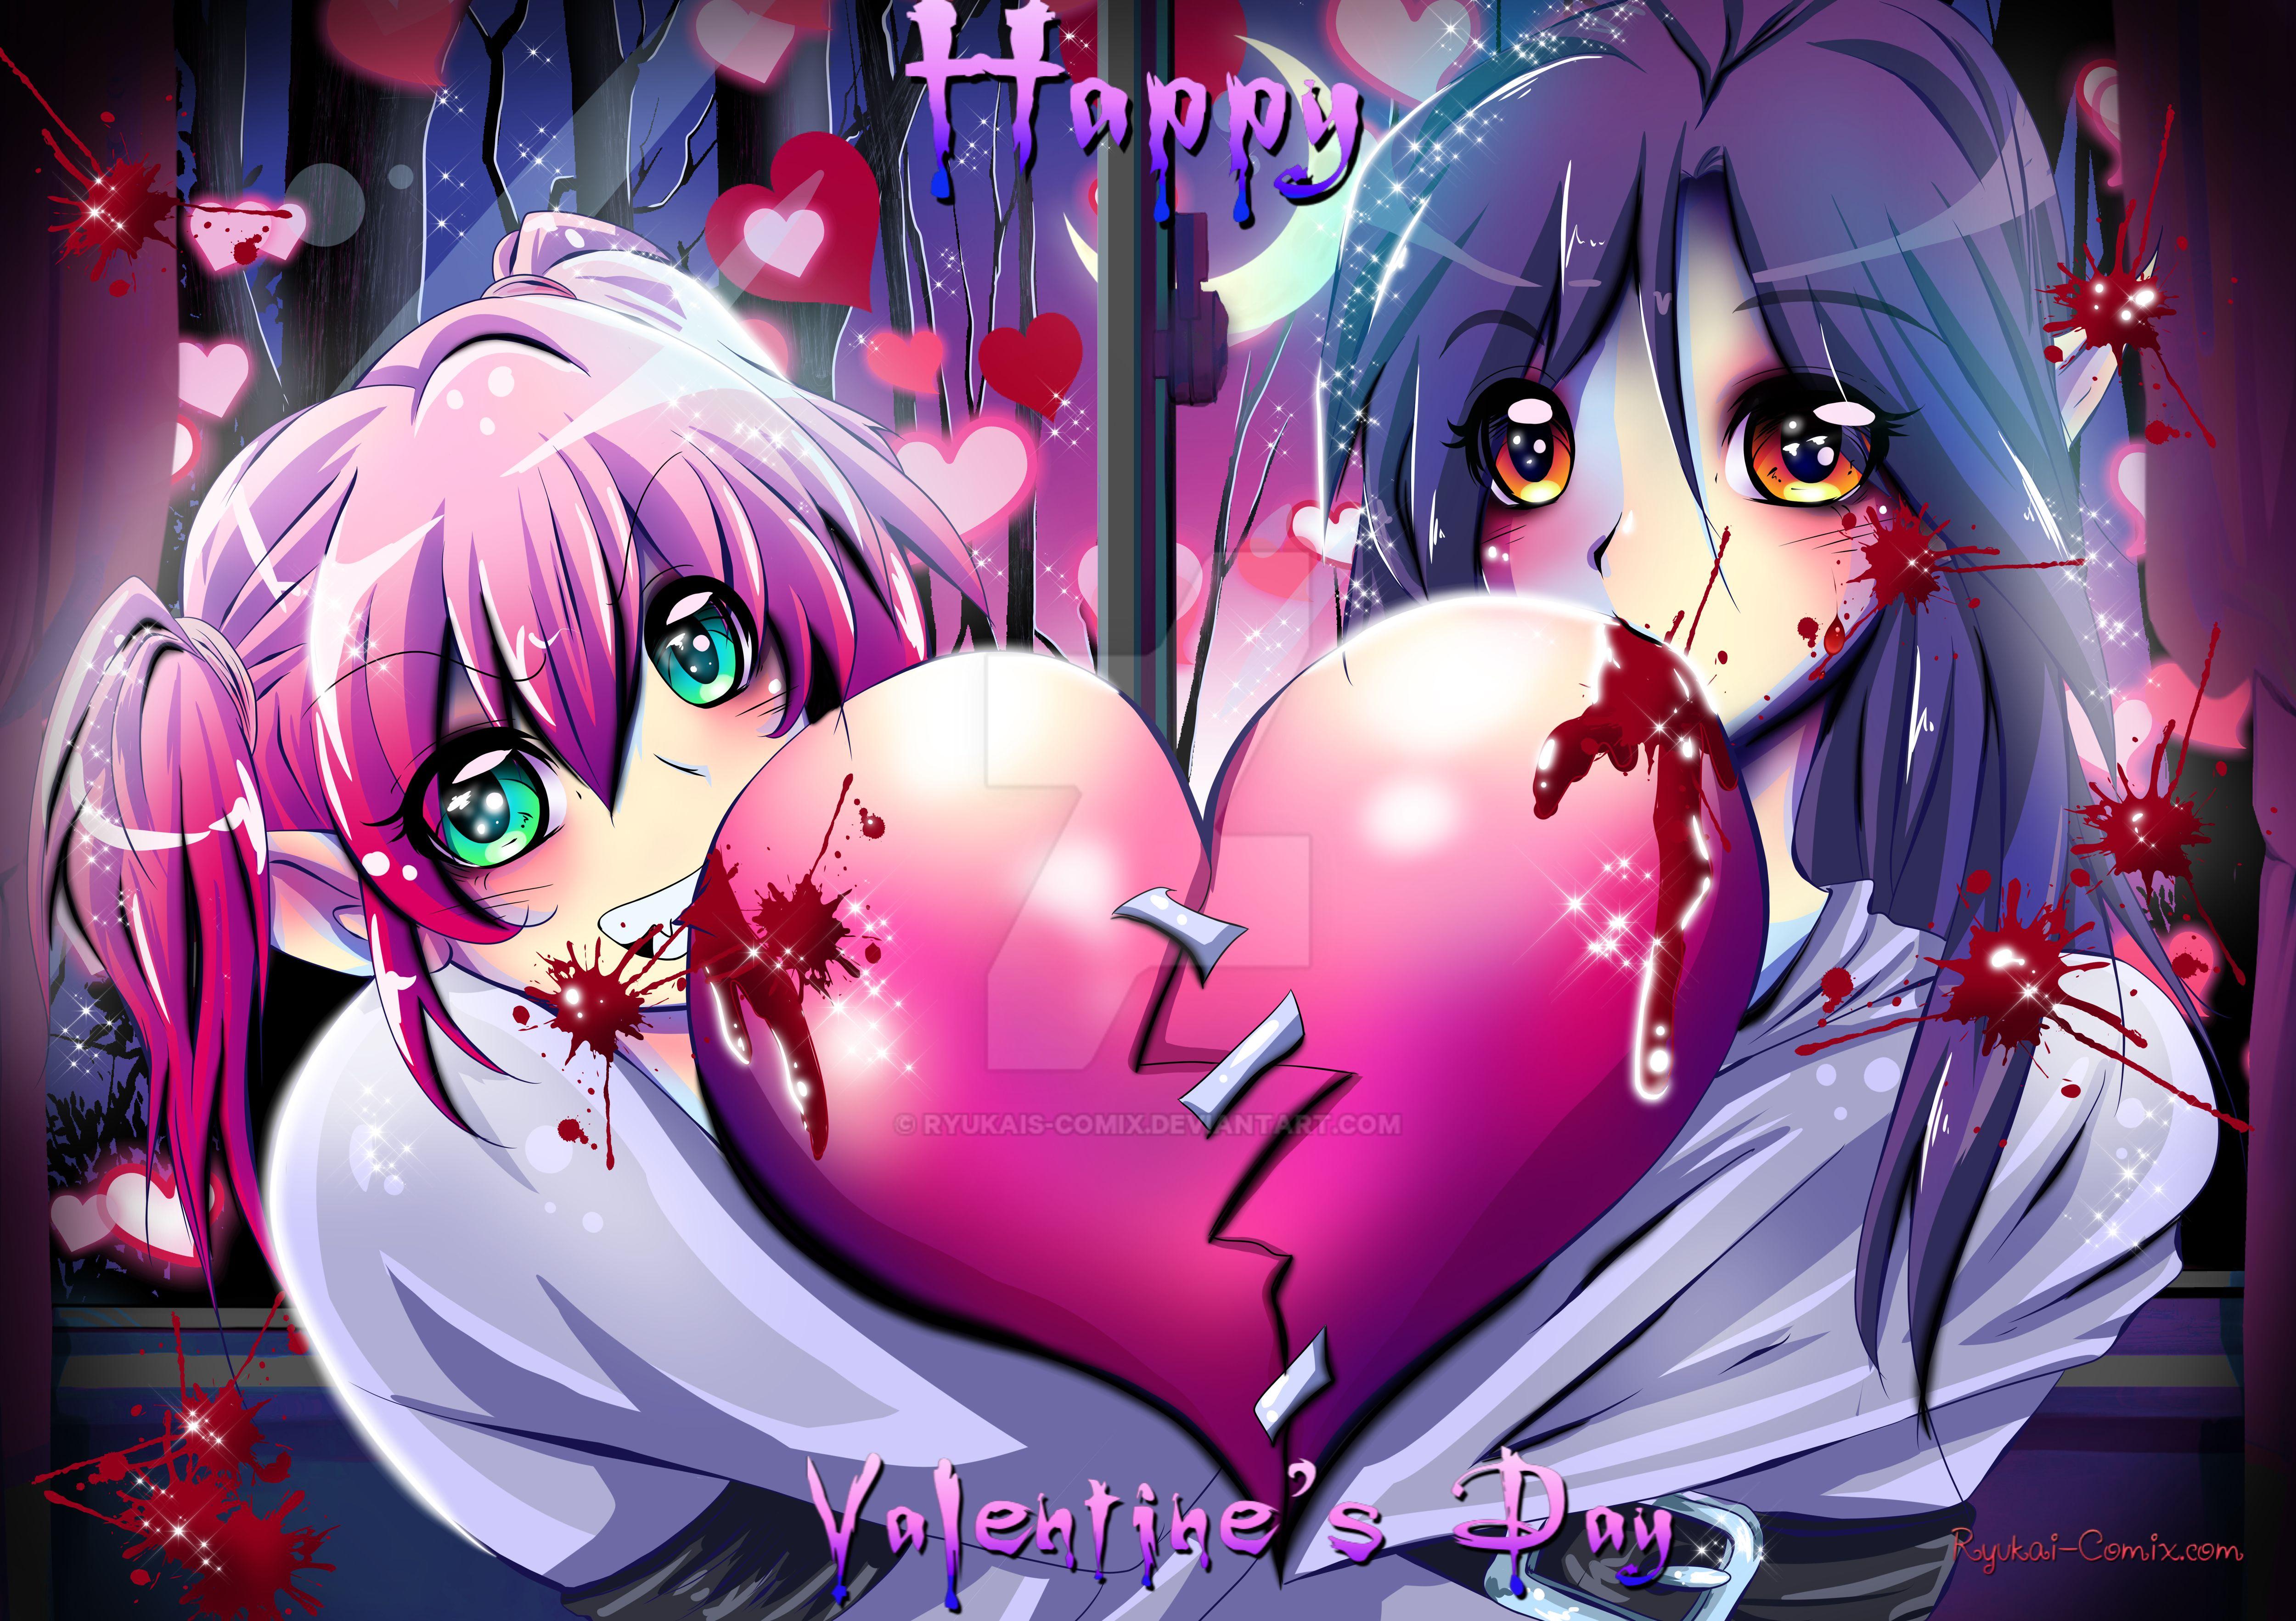 Happy valentines day! by RyuKais-Comix